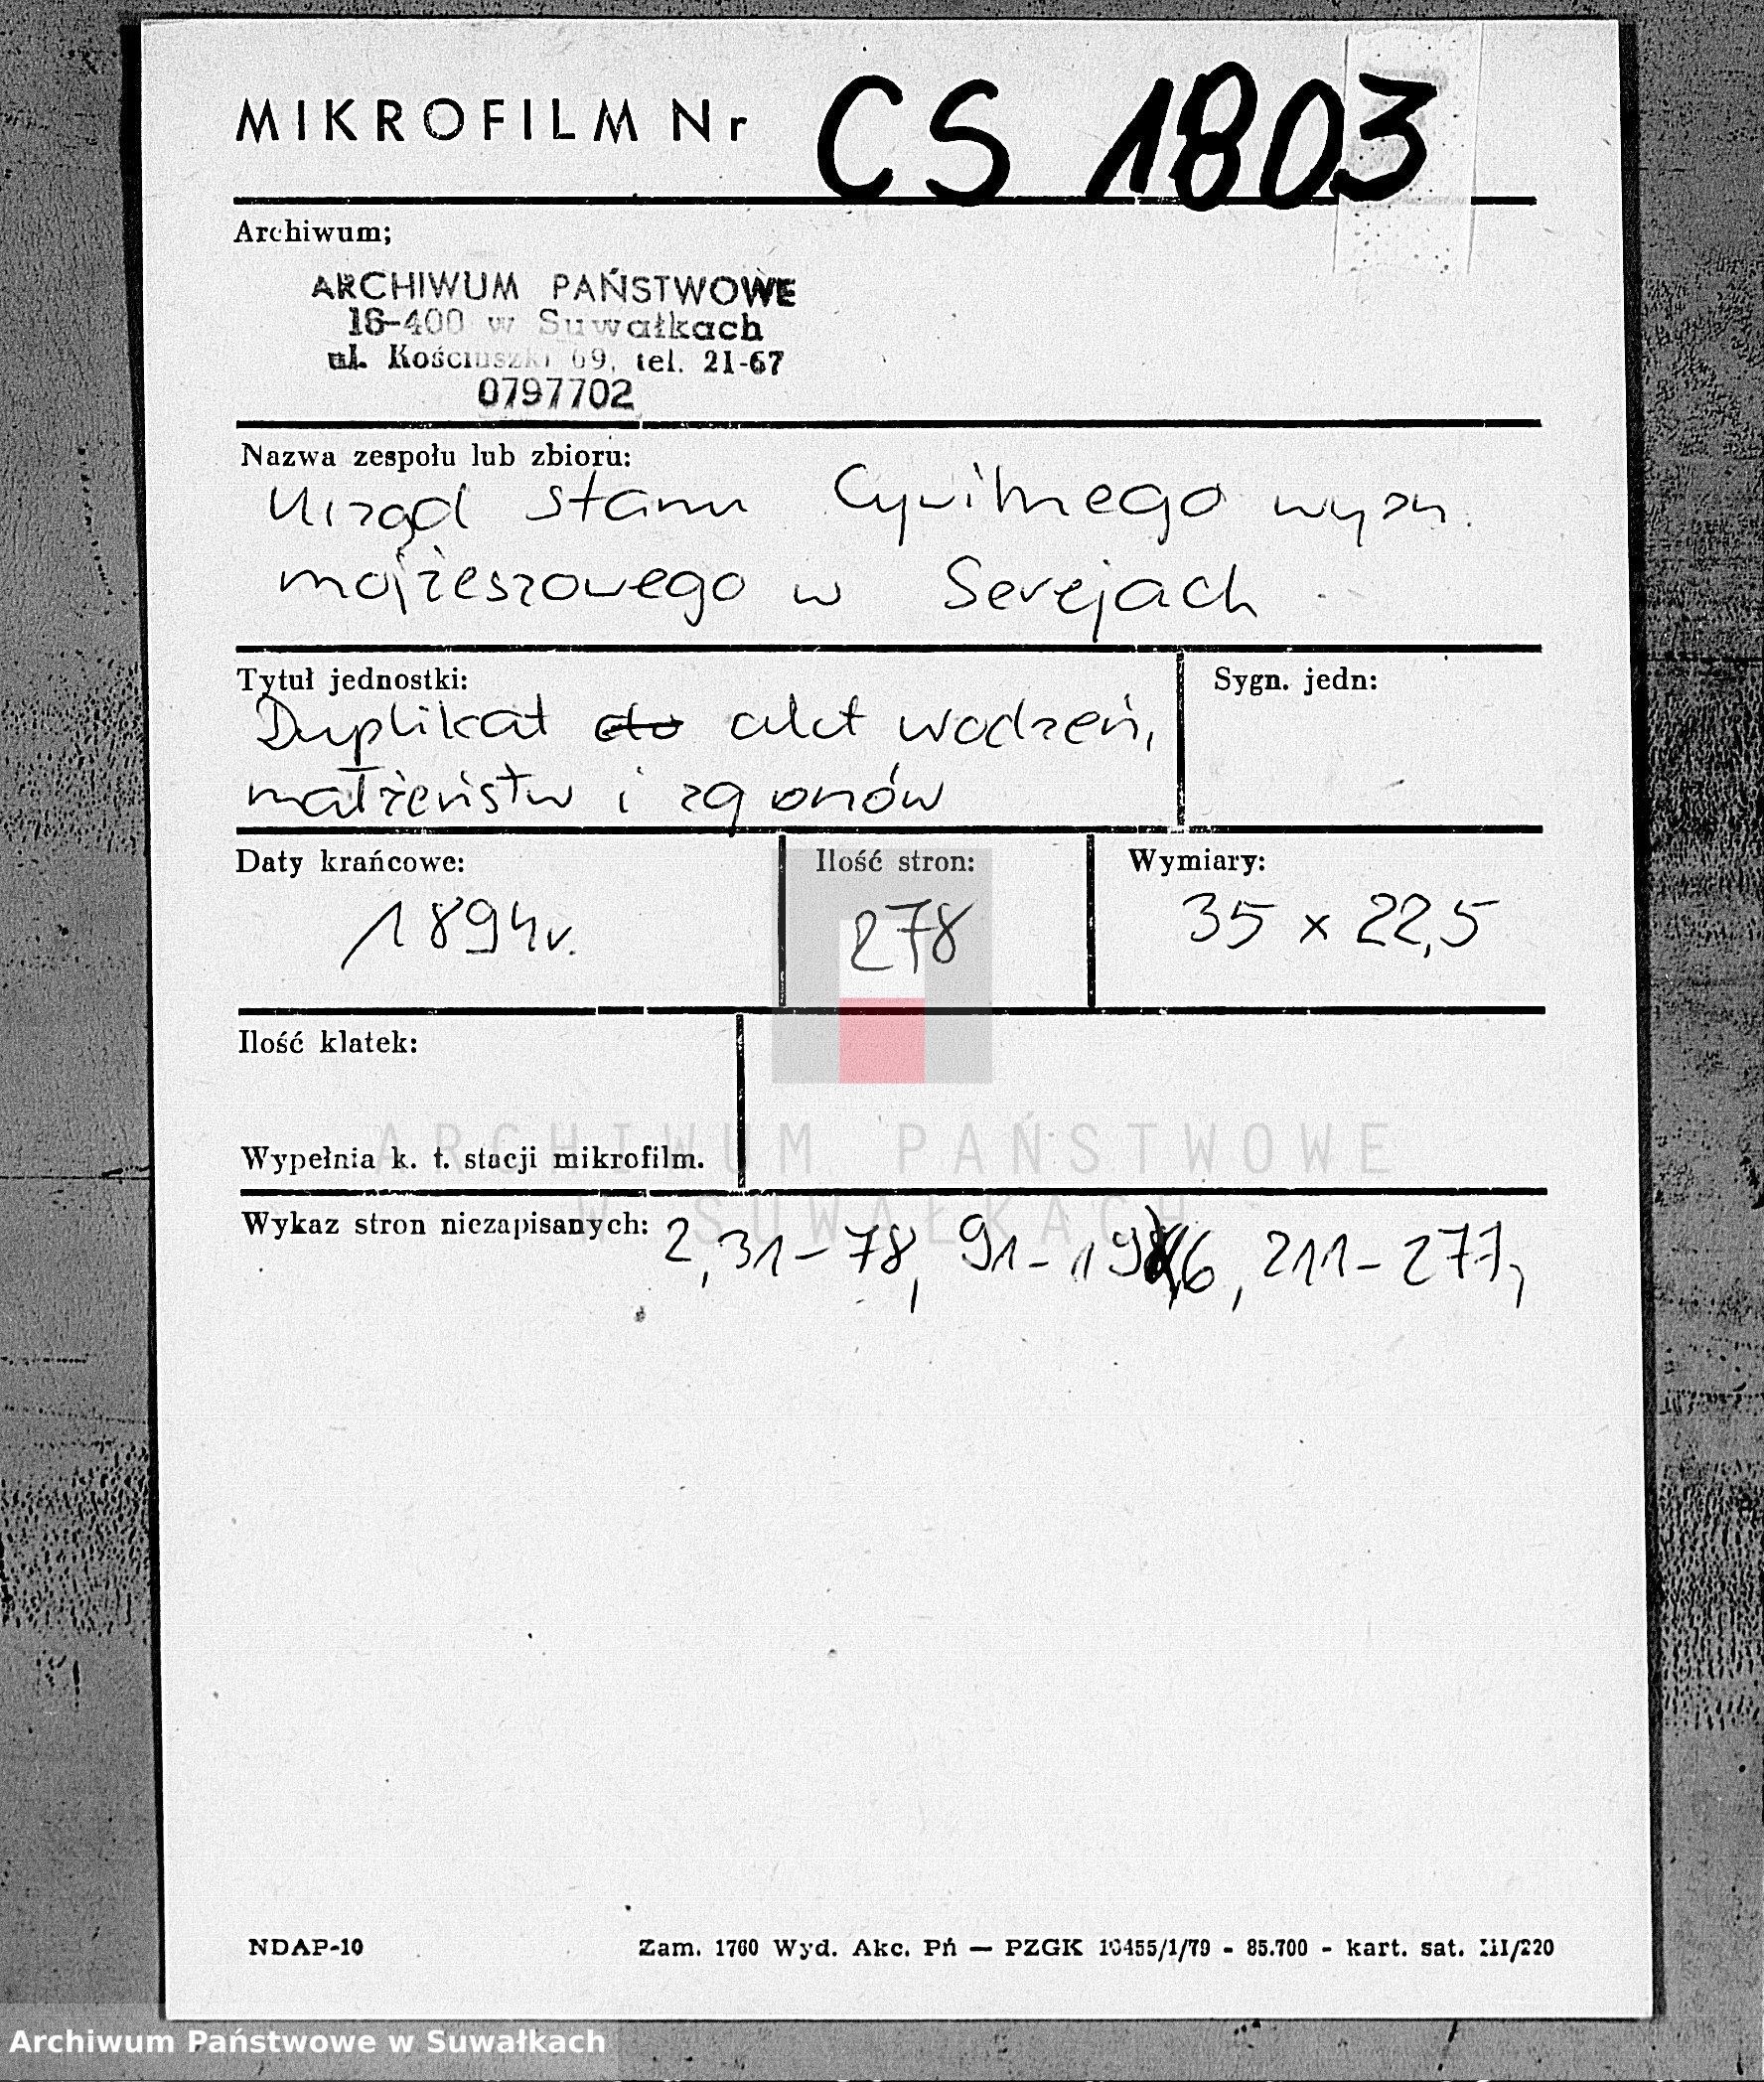 Skan z jednostki: Duplikat aktov graždanskogo sostojanija o rodivšichsja, brakosočetavšichsja i umeršich Evrejach v Serejskom Božničnom Okruge na 1894 god